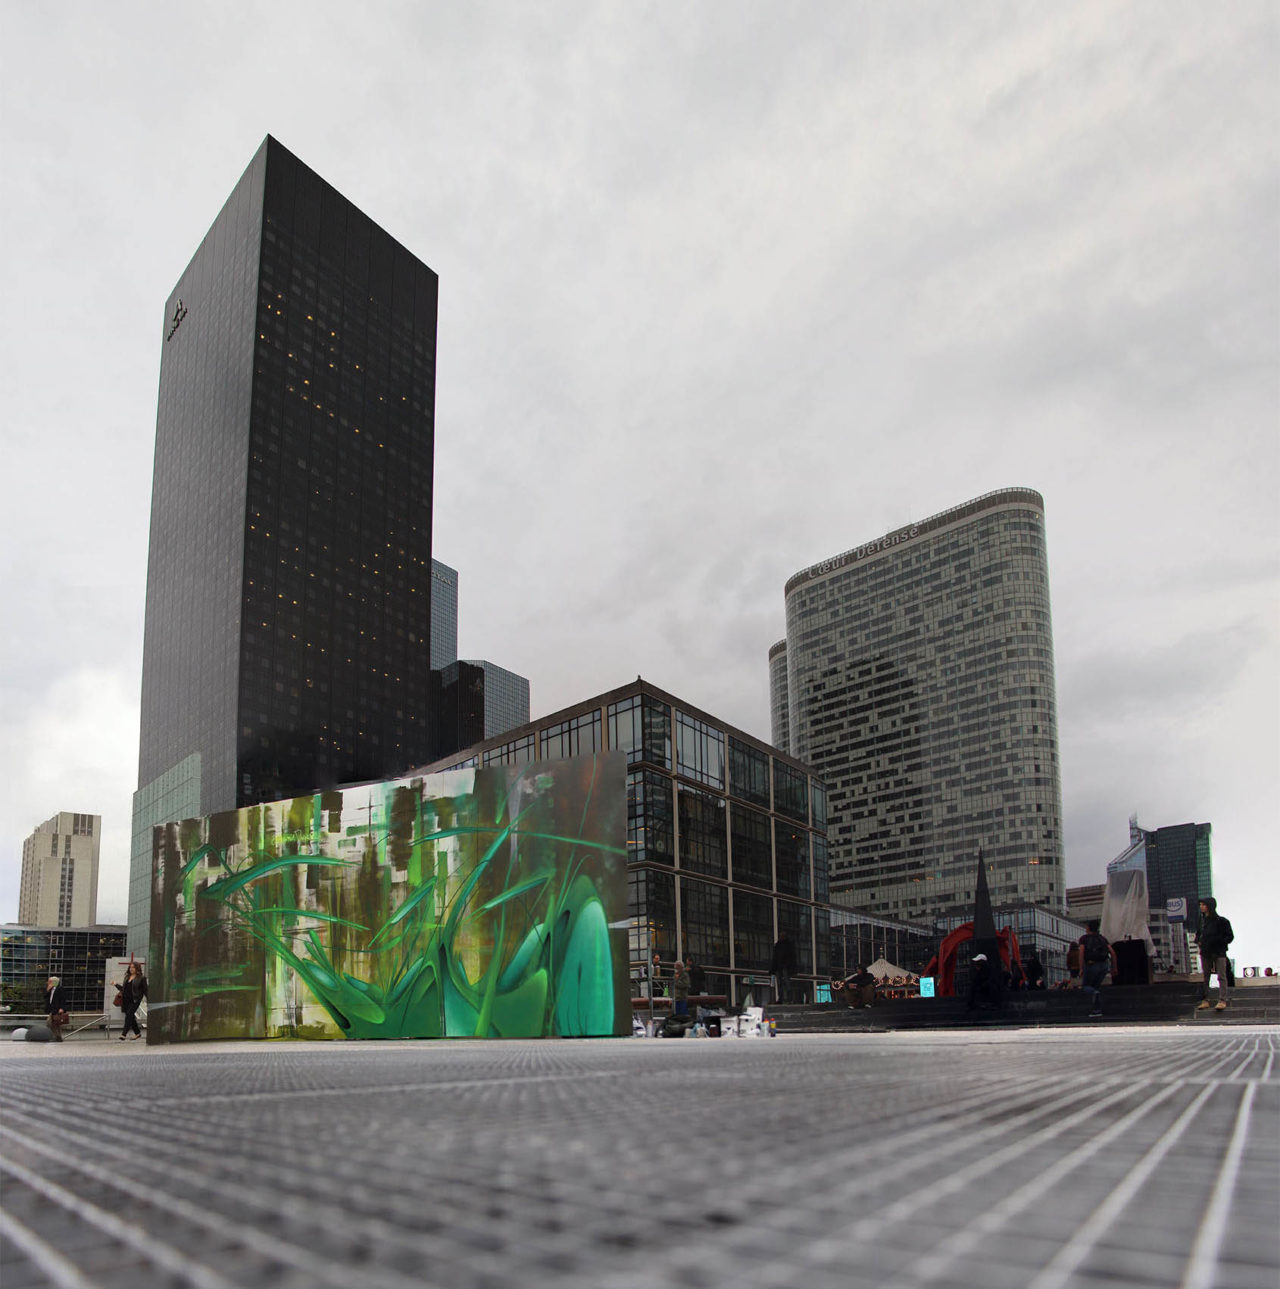 benjamin-duquenne-amin-futuriste-nature-roubaix-propaganza-urban-artist-graffiti-graff-street-art-spray-painting-belgique-8-1280x1289.jpg